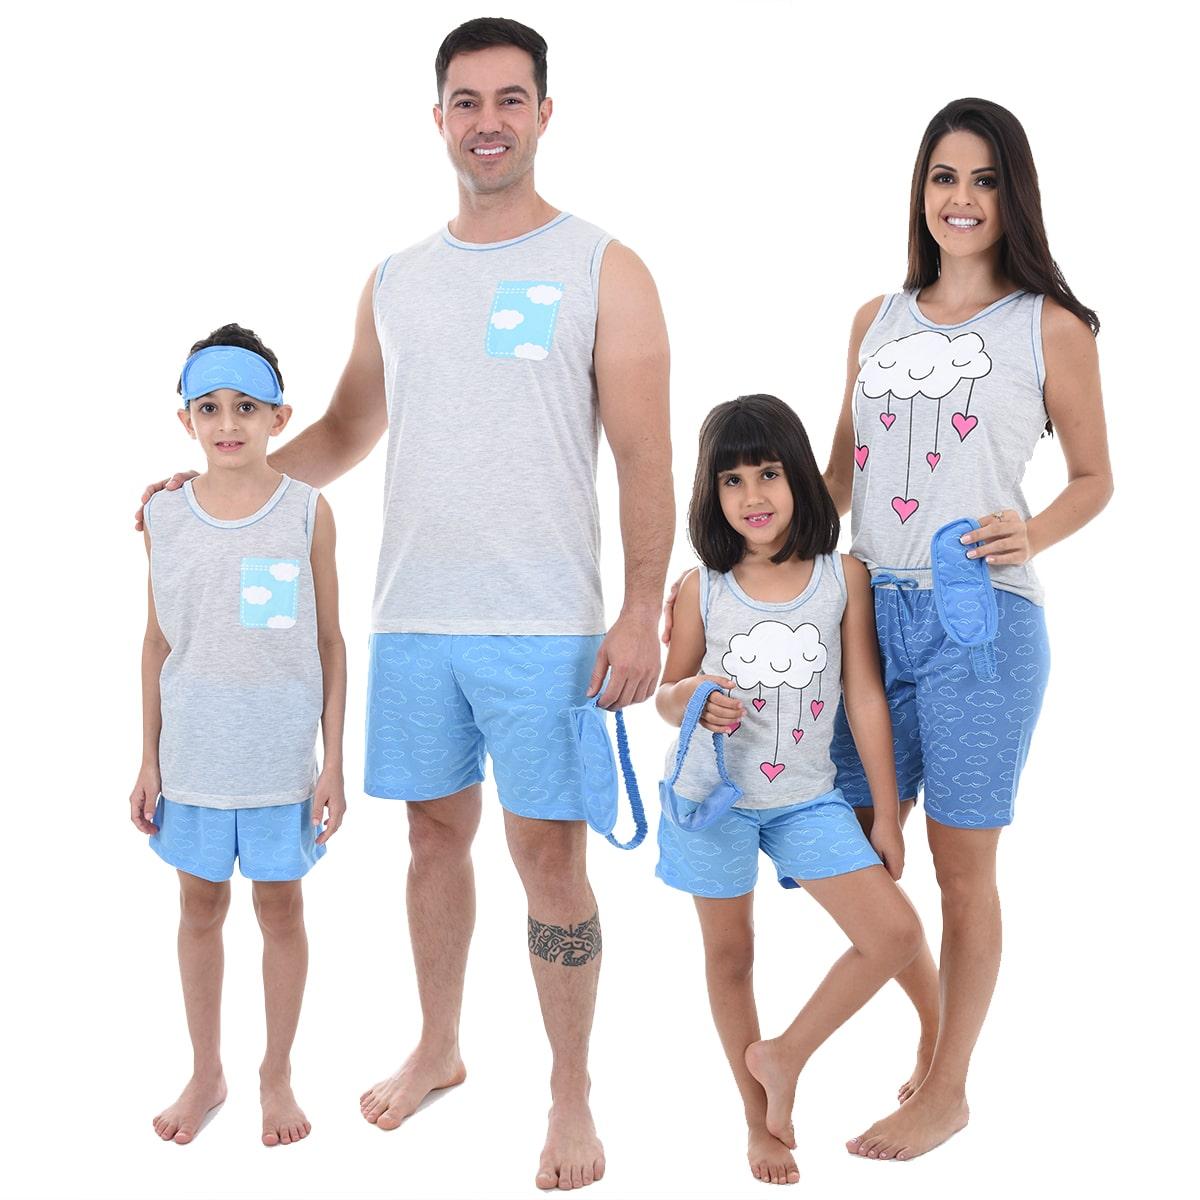 Pijama Masculino Infantil Regata Malha Estampa Short Tapa Olho Chuva de Amor 447